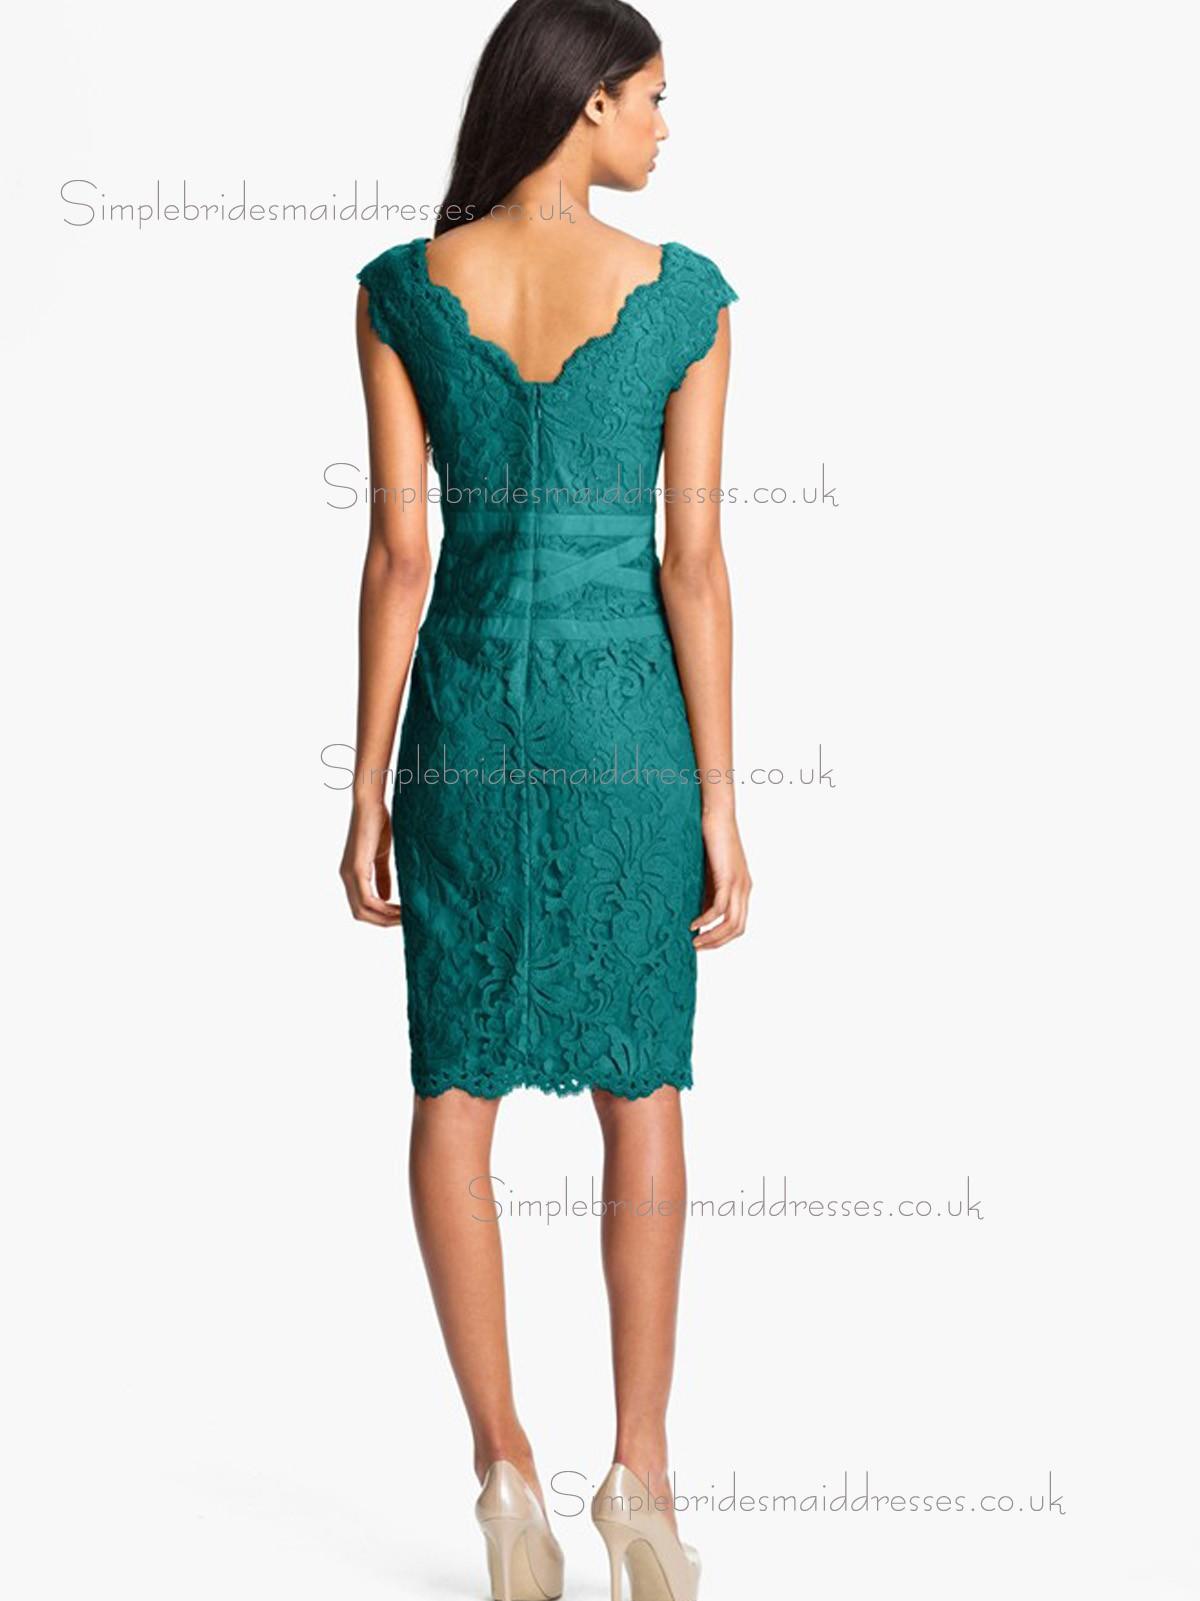 Vintage knee length jade applique lace bridesmaid dresses for Jade green wedding dresses